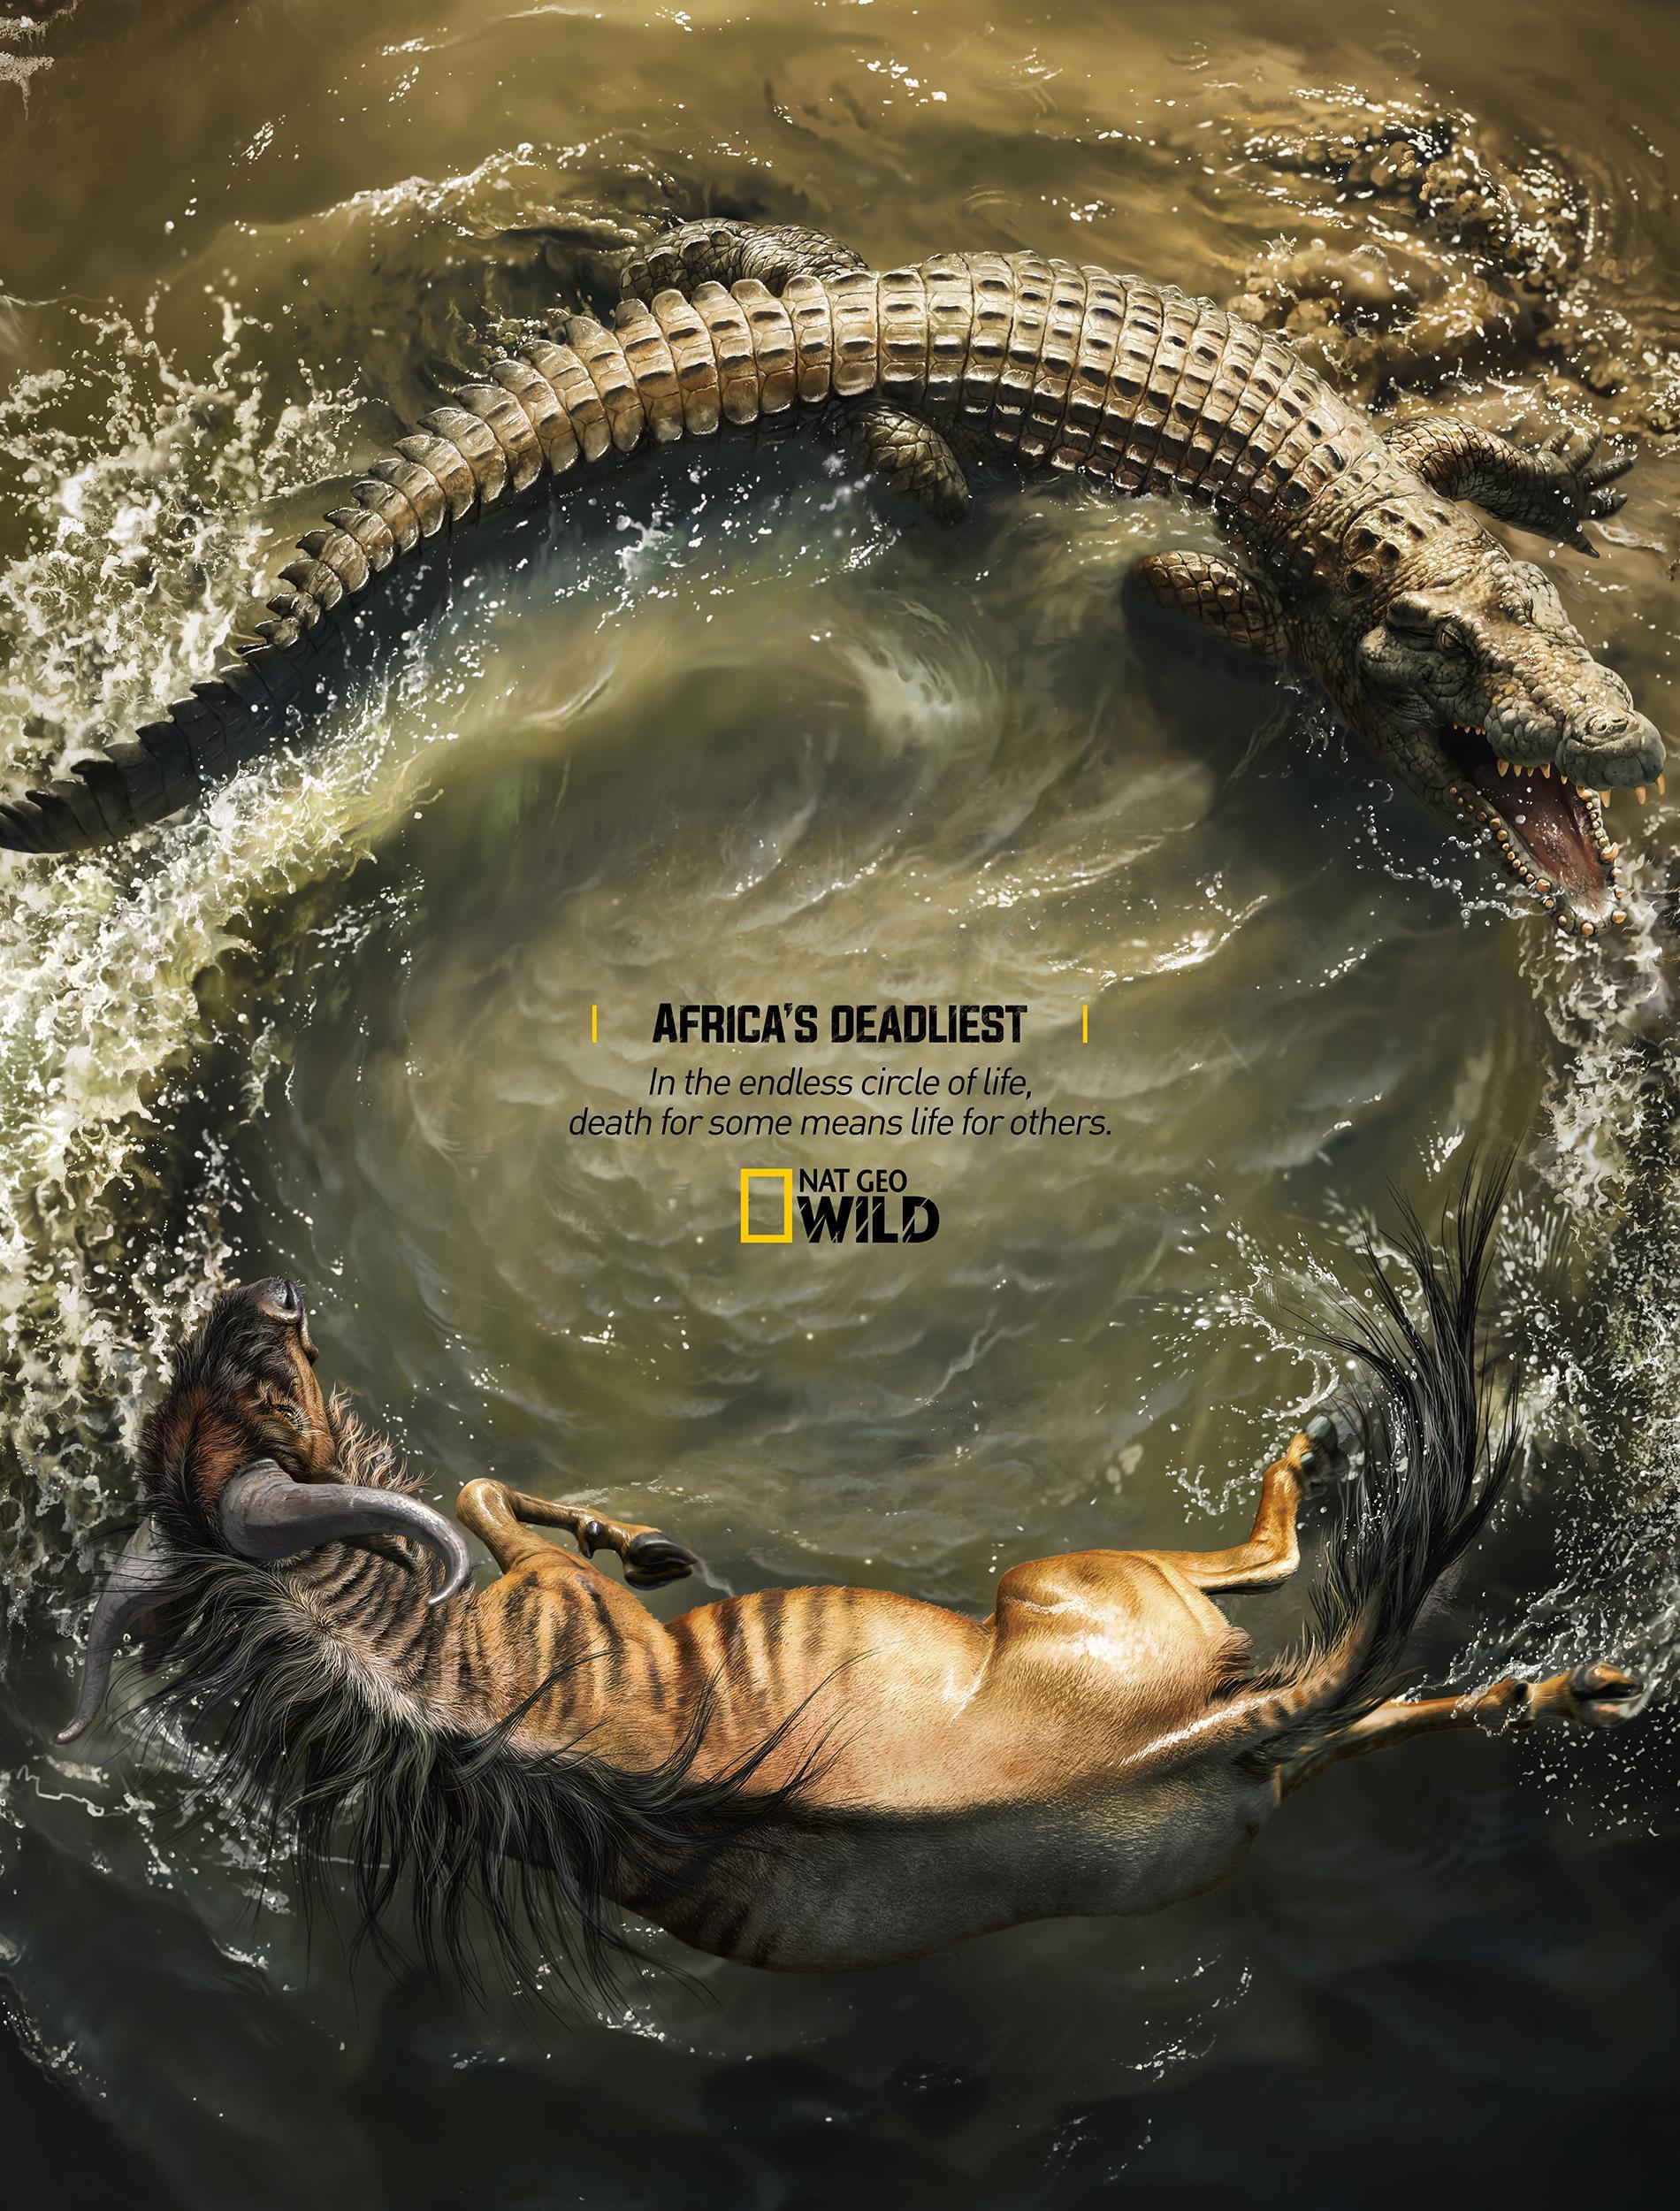 National Geographic Print Ad - Africa's Deadliest - Crocodile X Wildebeest